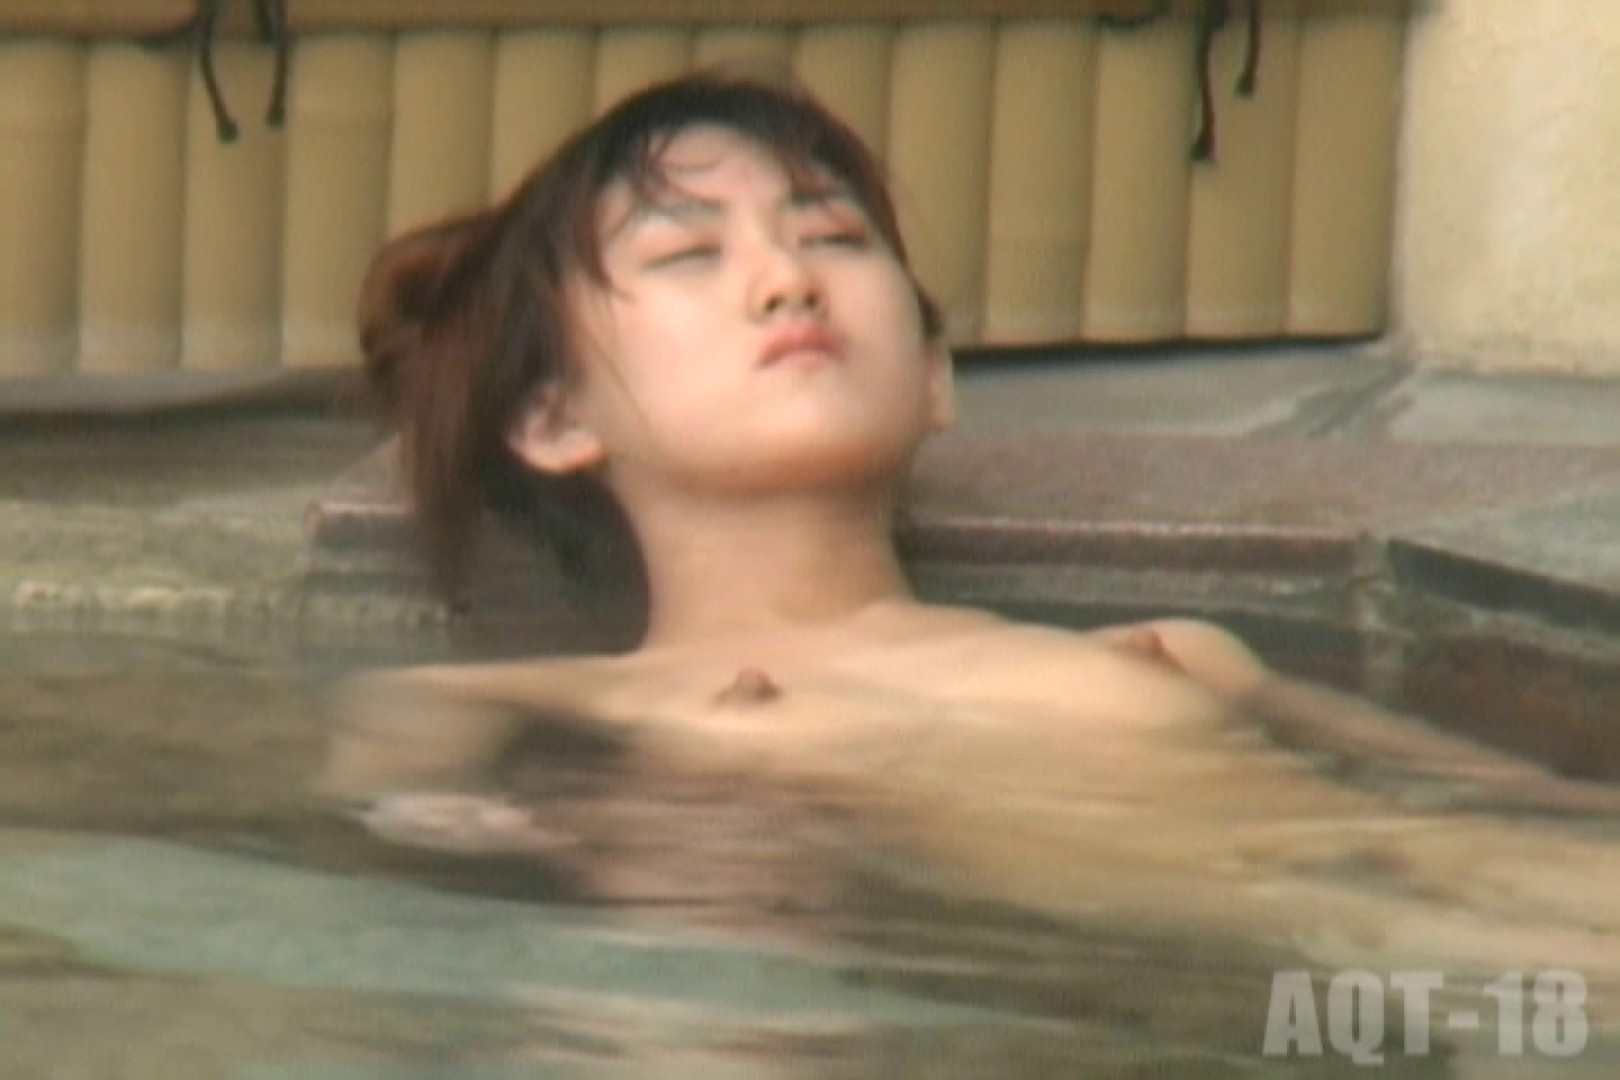 Aquaな露天風呂Vol.862 美しいOLの裸体 戯れ無修正画像 99pic 26